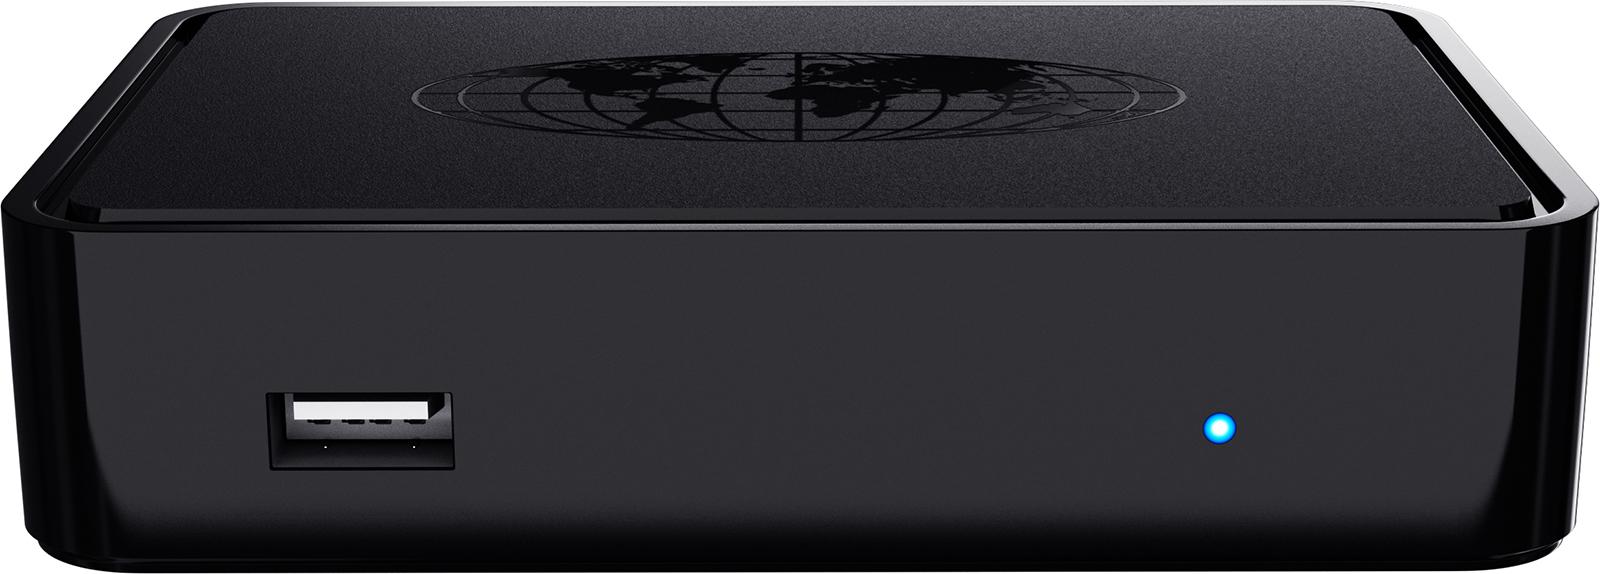 IPTV SET-TOP BOX MAG254